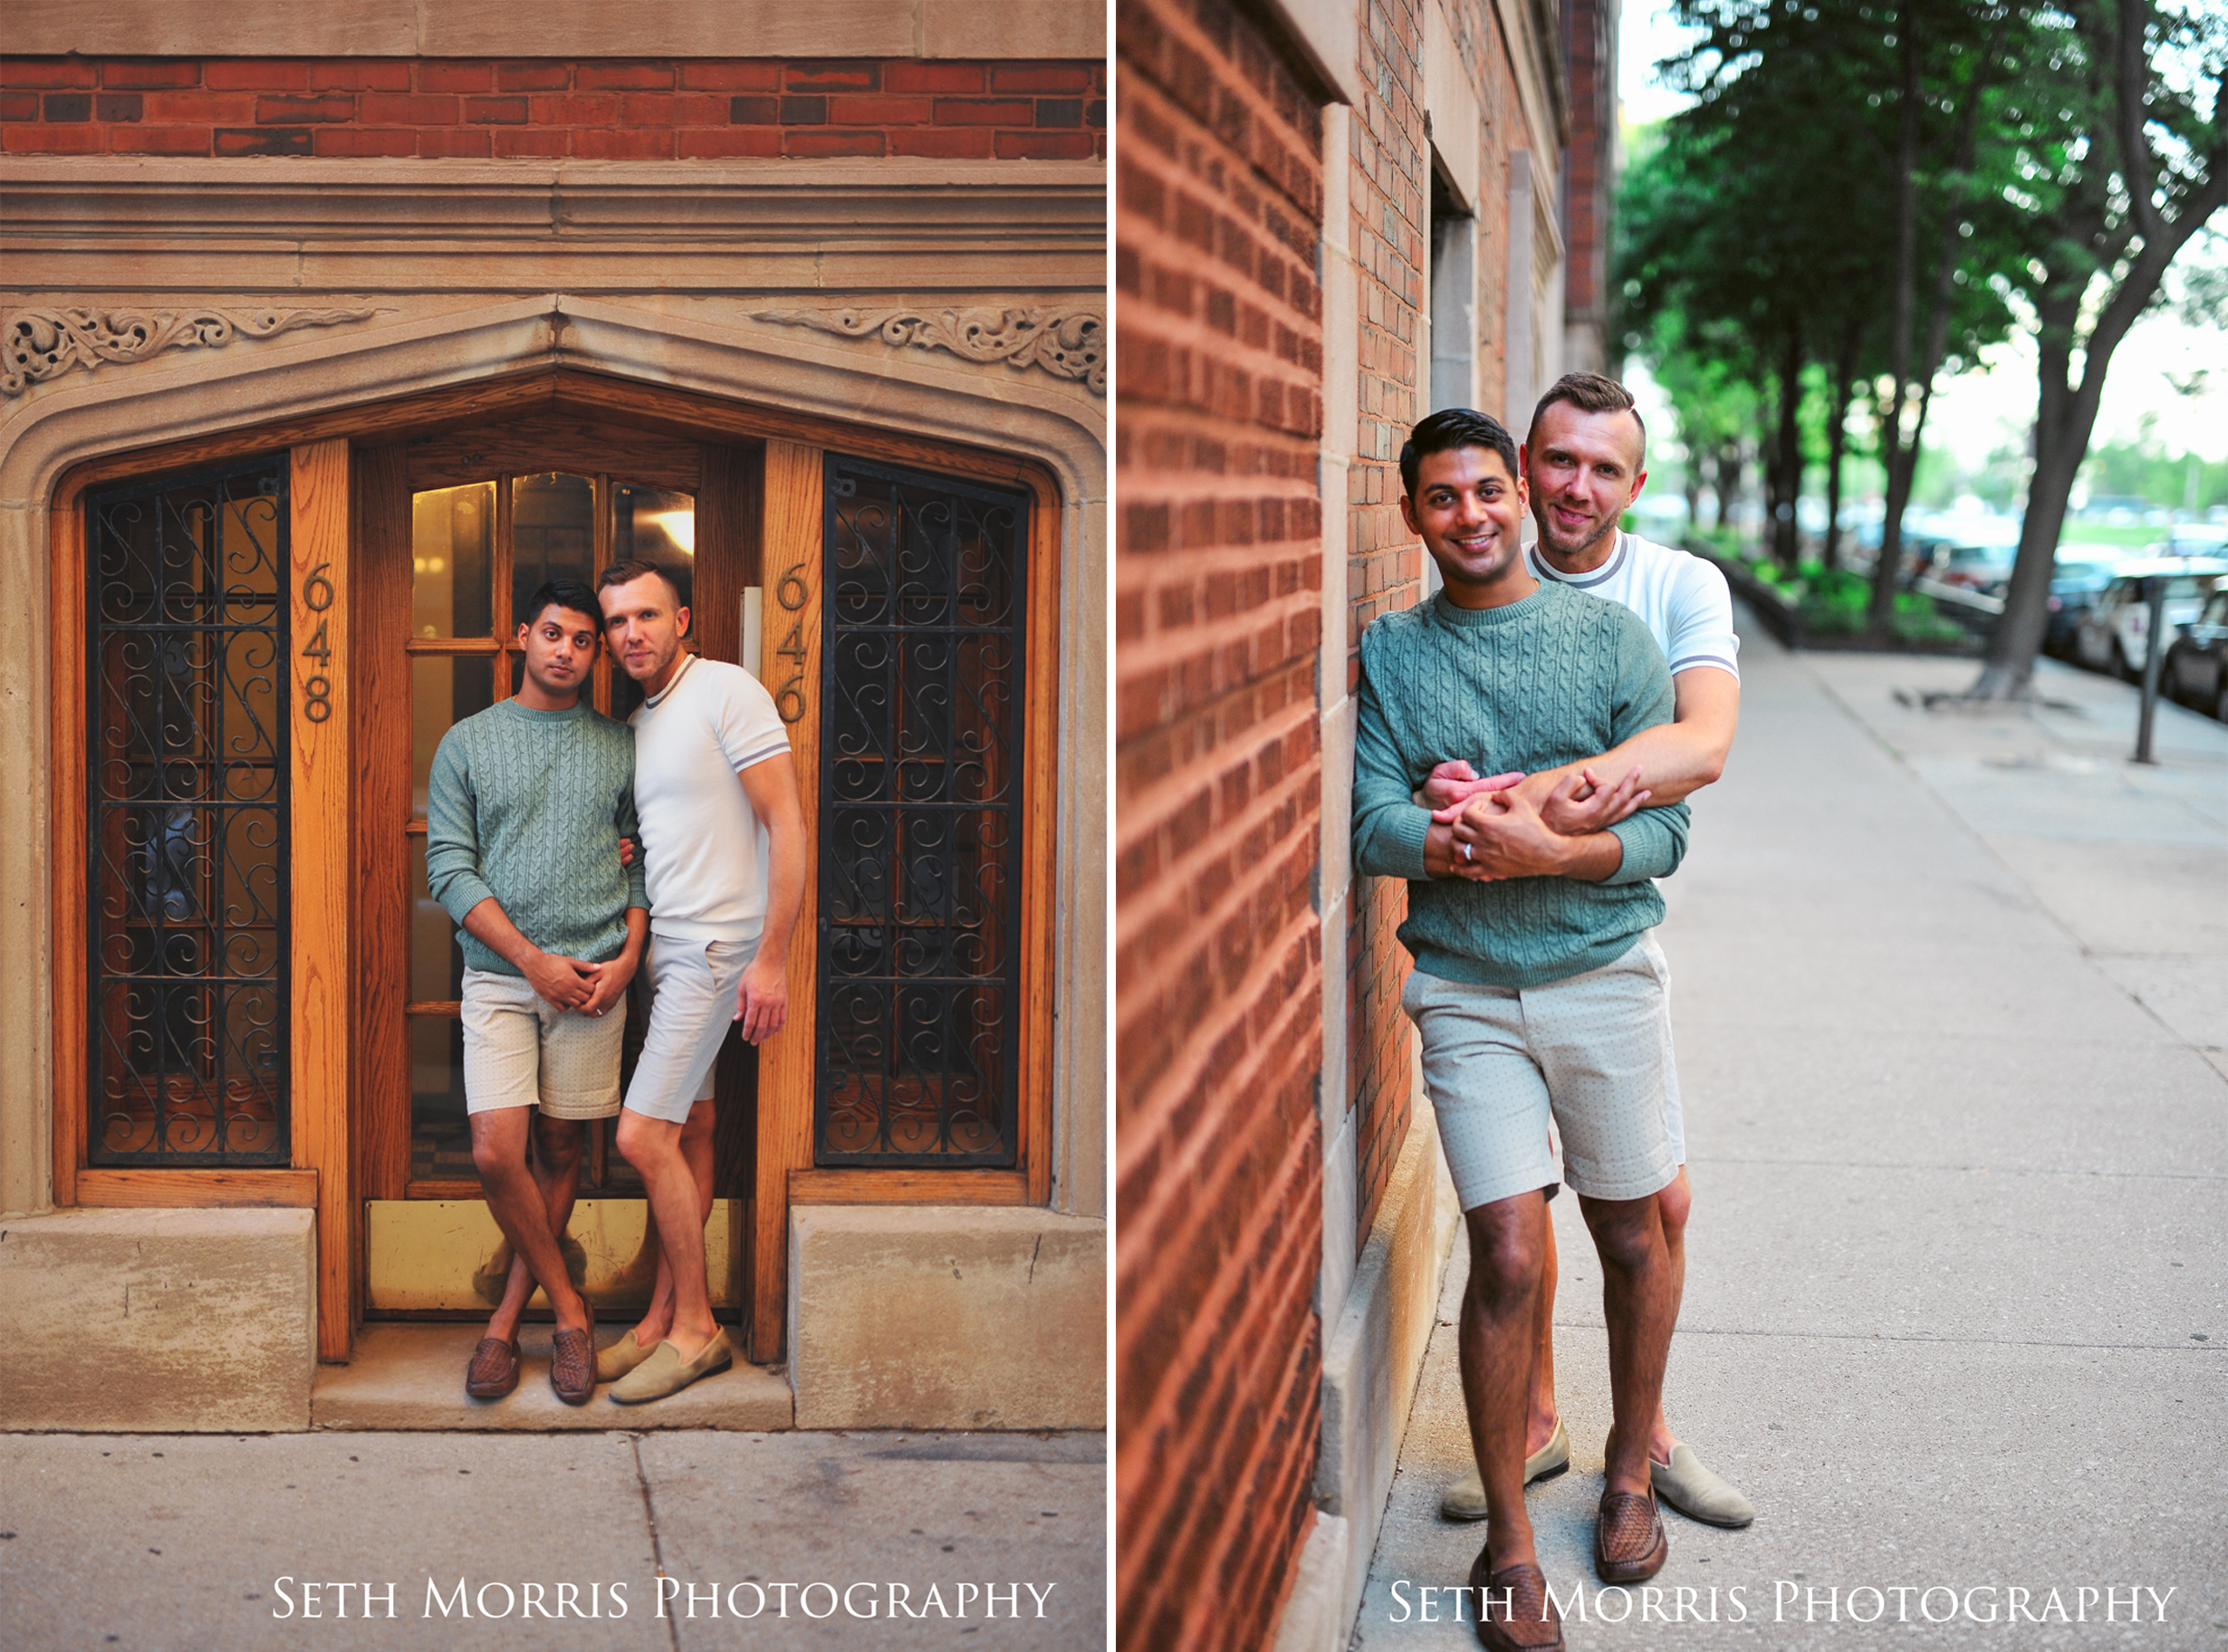 chicagoland-engagement-photographer-same-sex-wedding-23.JPG